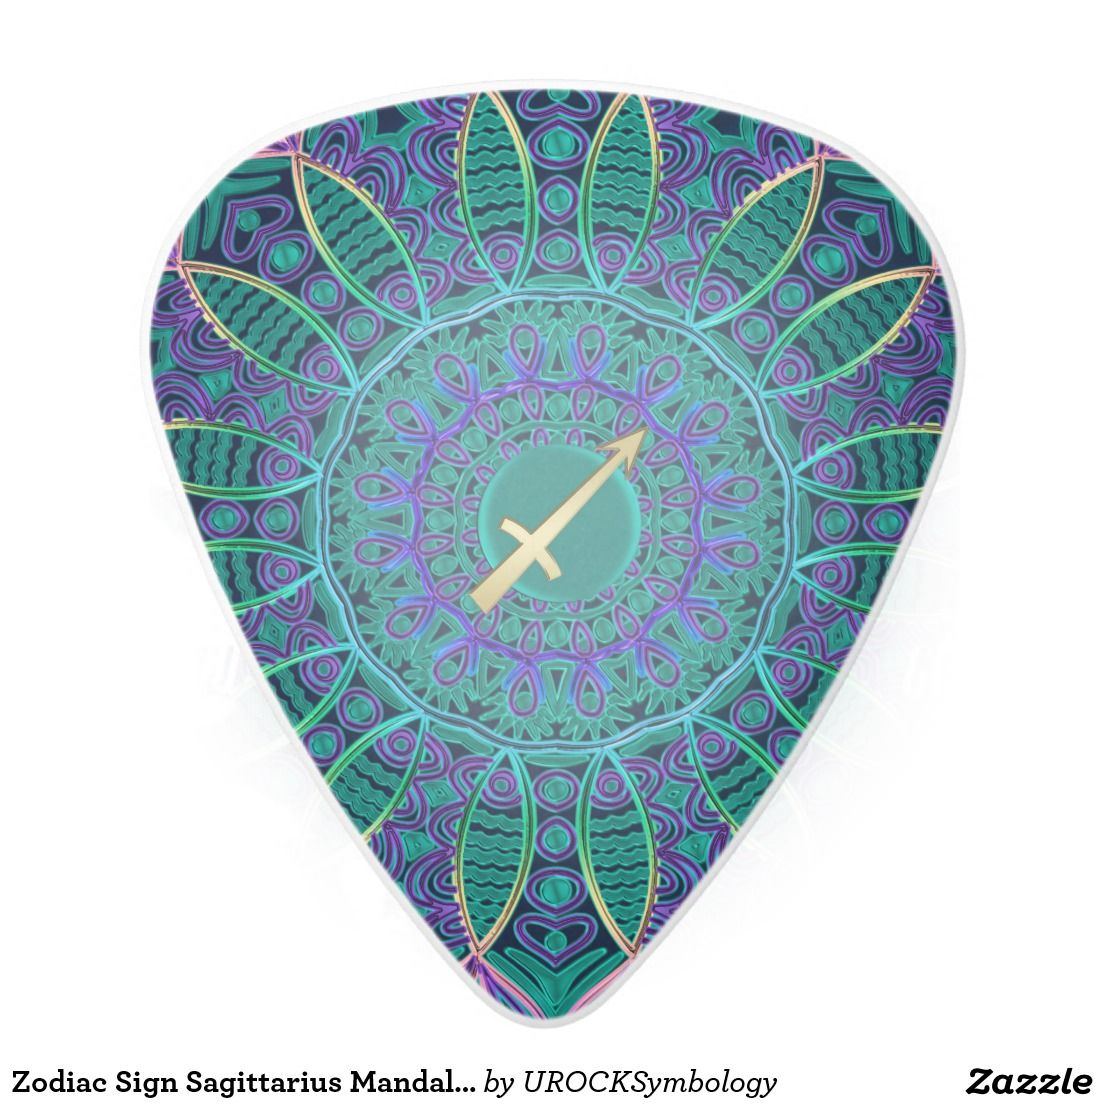 Zodiac Sign Sagittarius Mandala Guitar Pick Zazzle